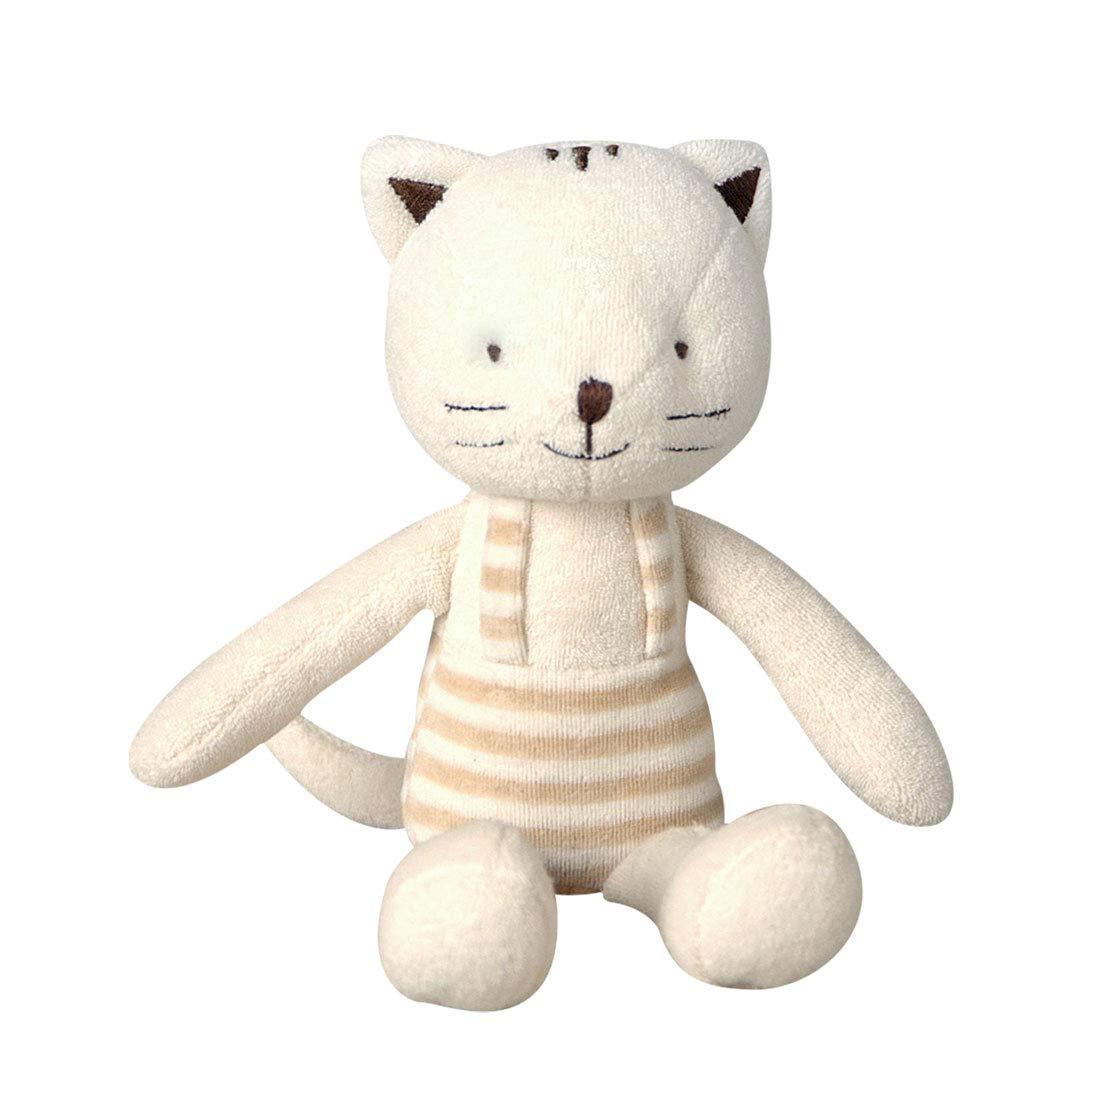 [Organic Shop] 100% Organic Cotton Baby Stuffed Animal Doll (Cat Doll)